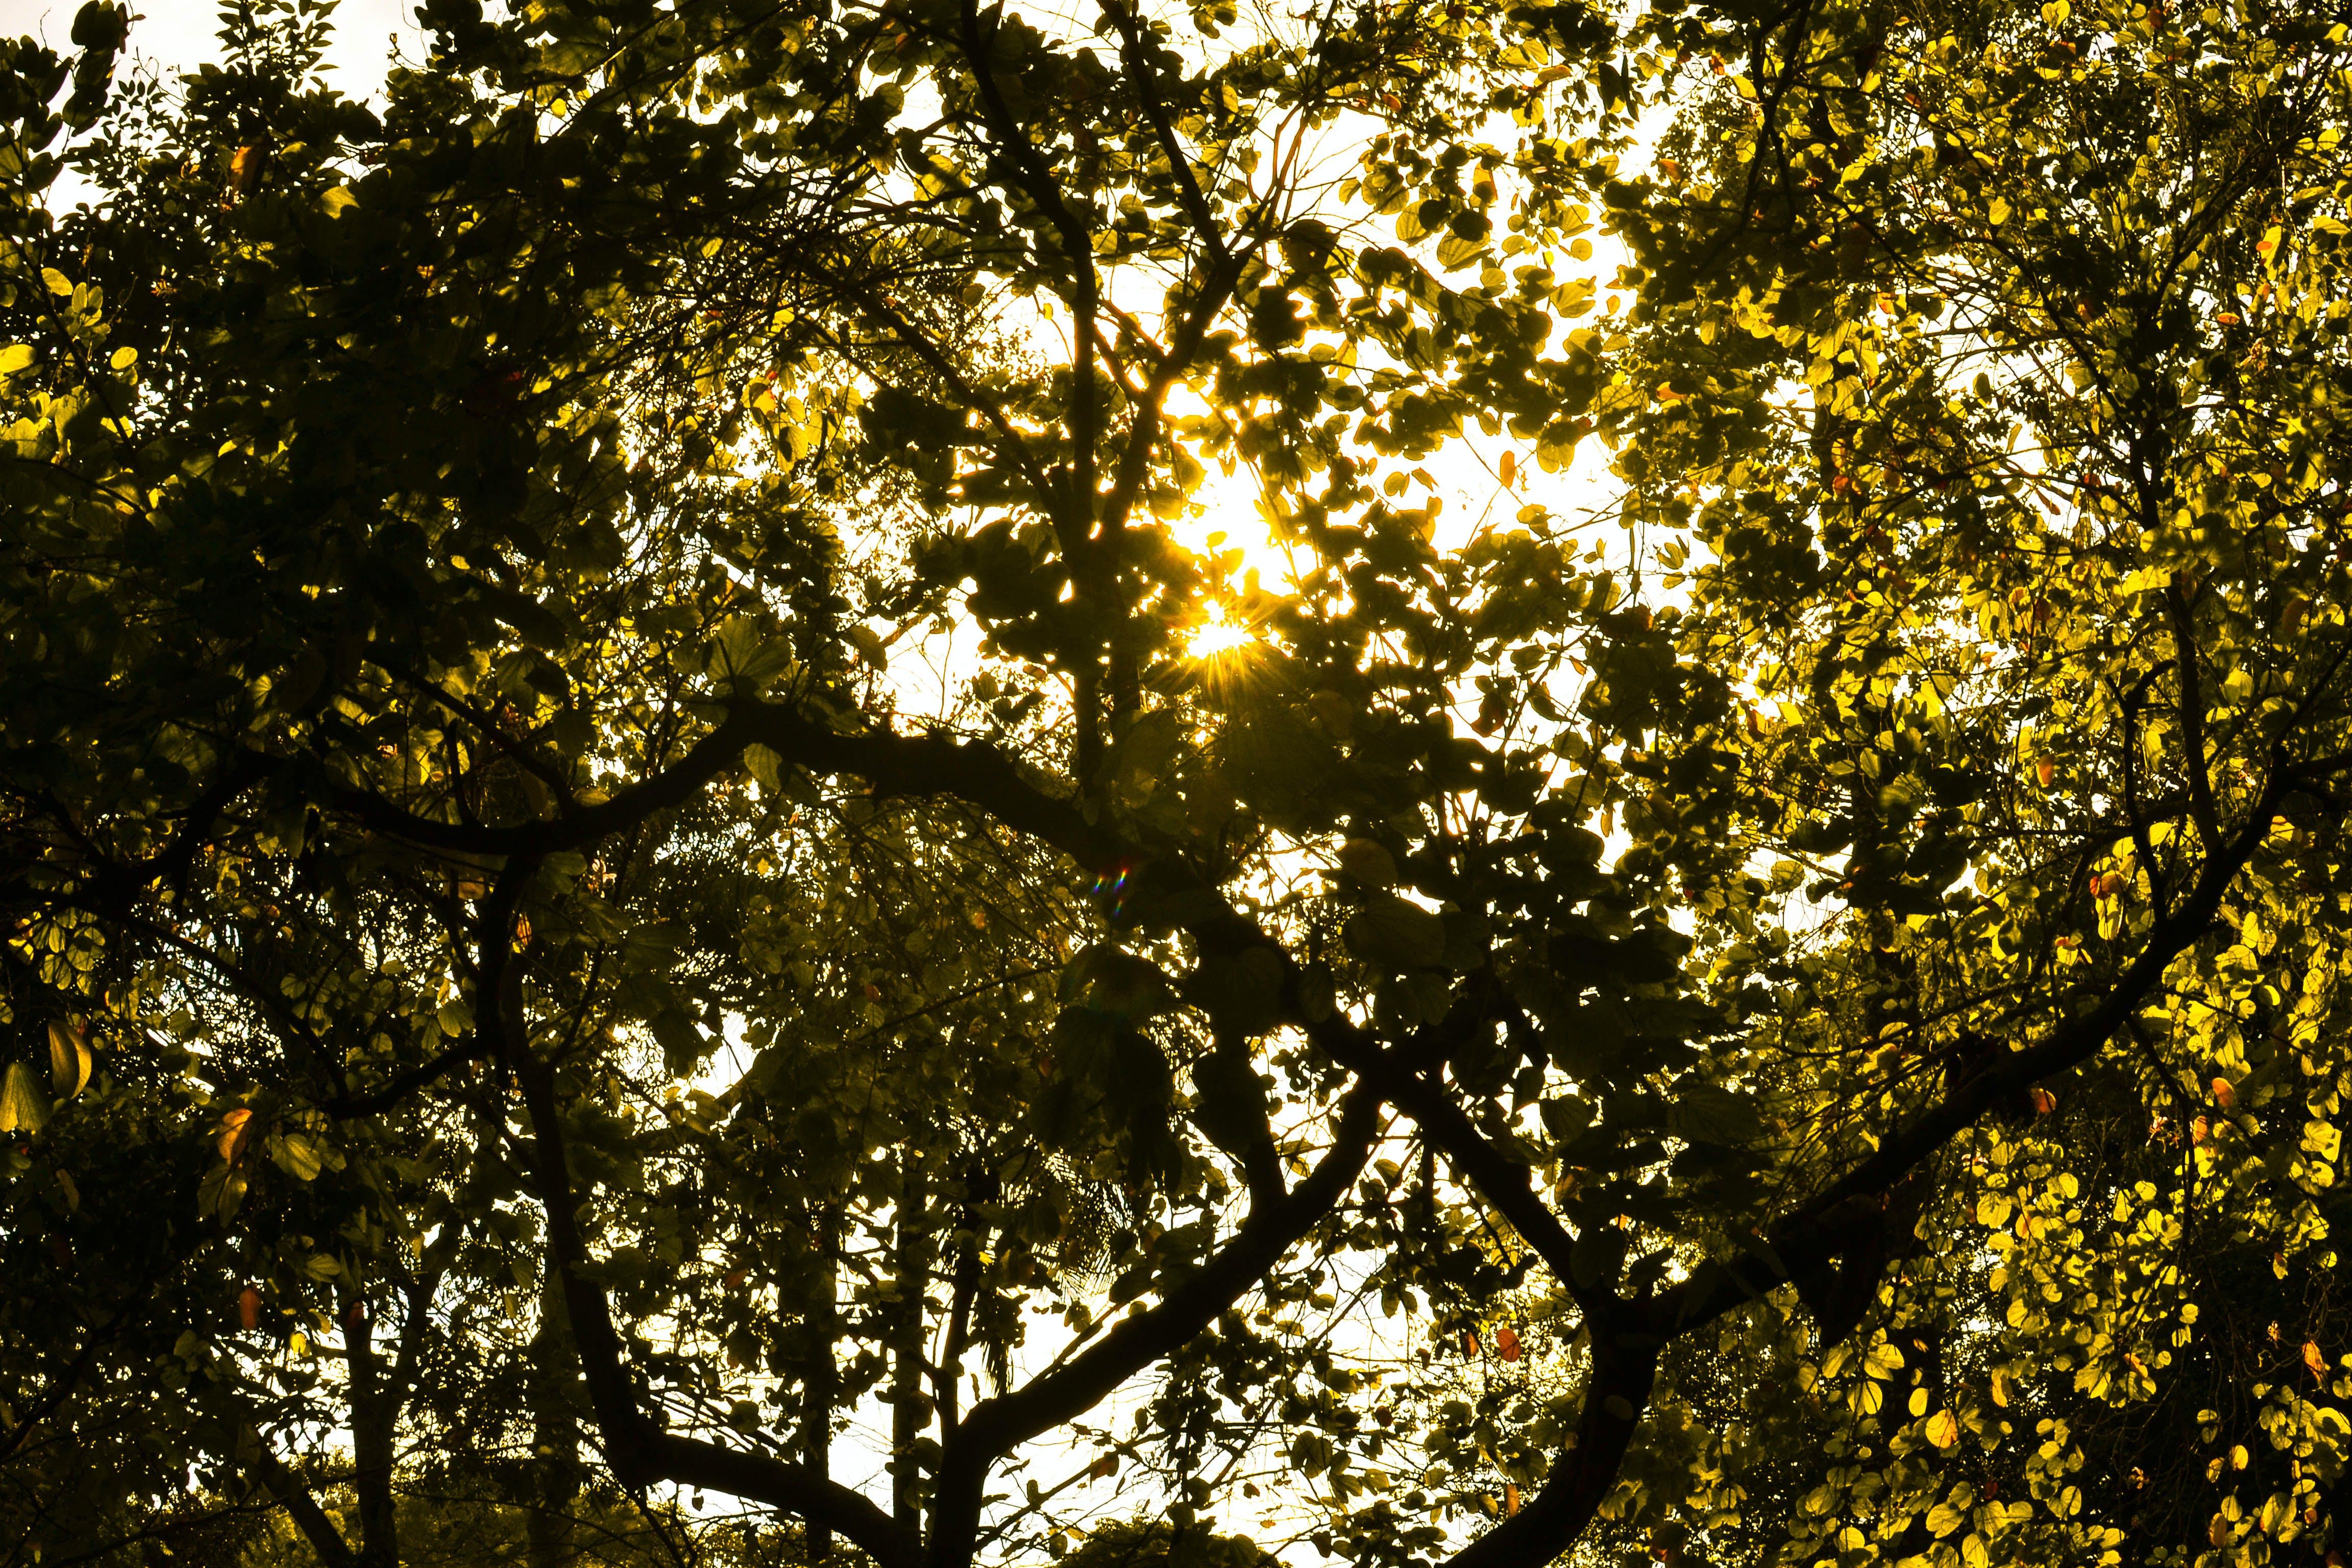 Sunshine Through Green Leafed Tree